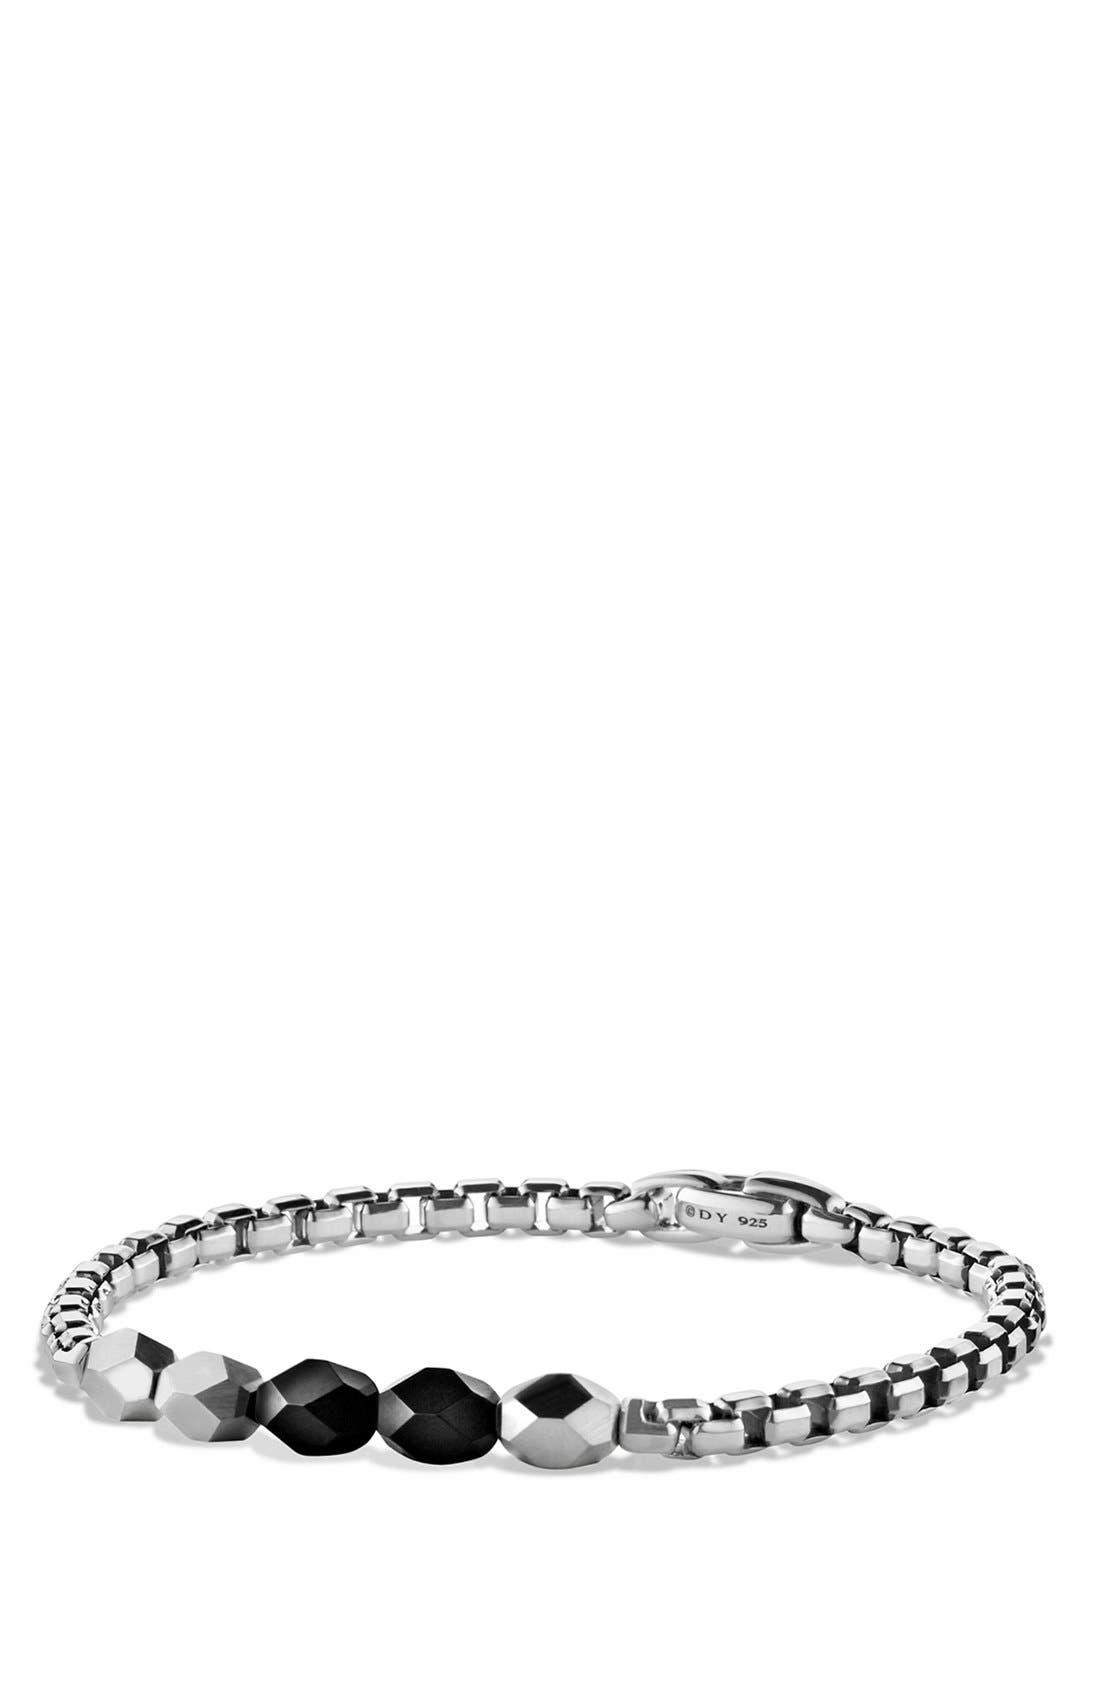 Main Image - David Yurman 'Faceted' Metal Bracelet